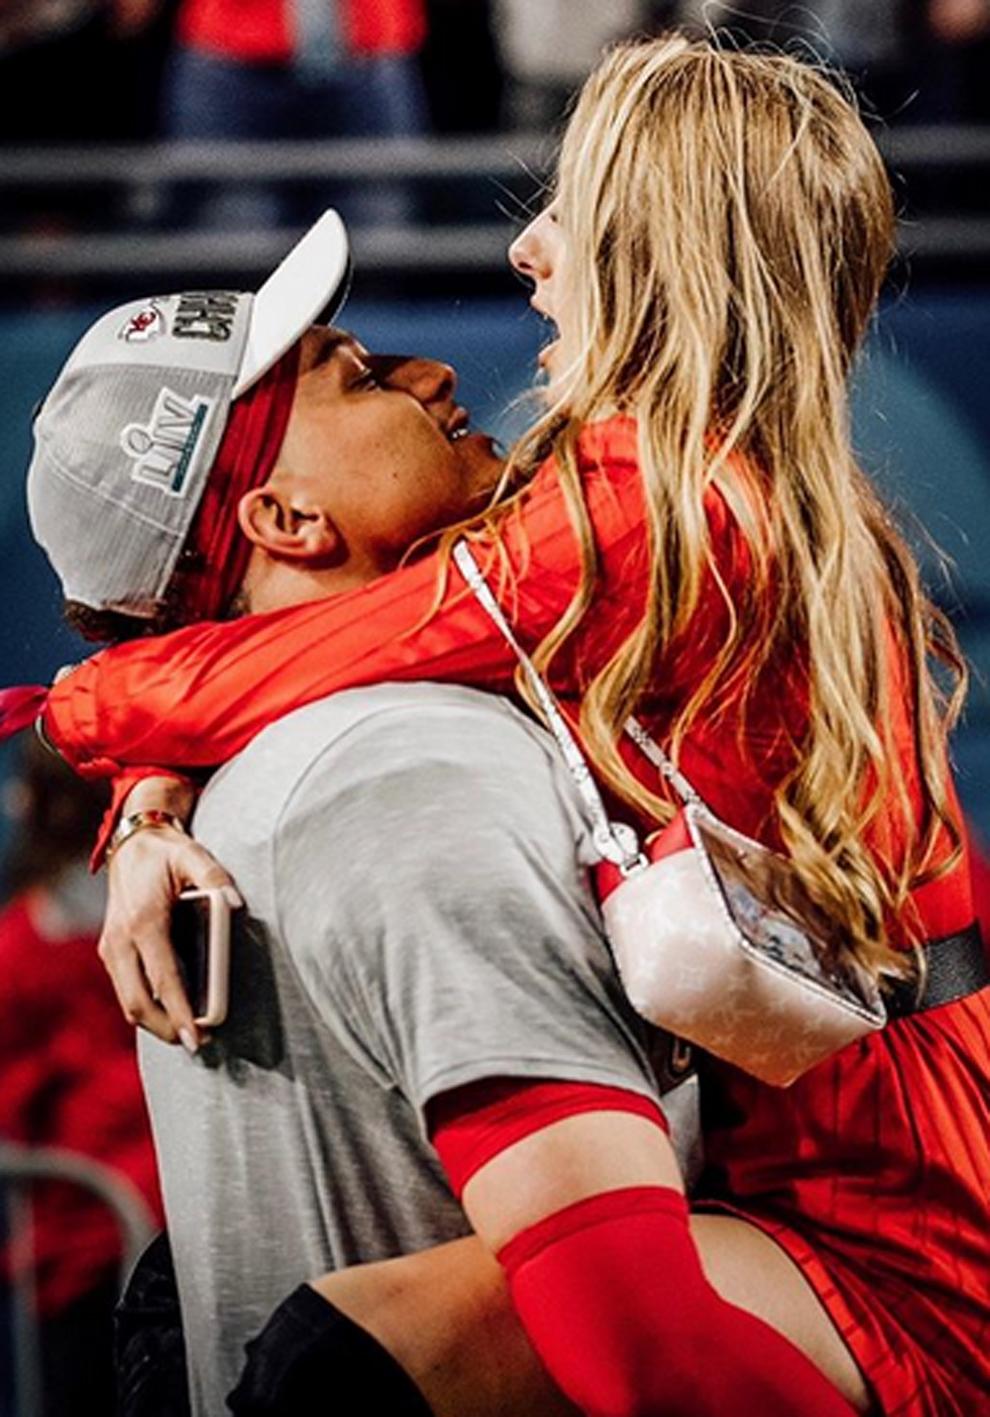 Patrick Mahomes tras ganar la Super Bowl abrazando a Brittany Matthews